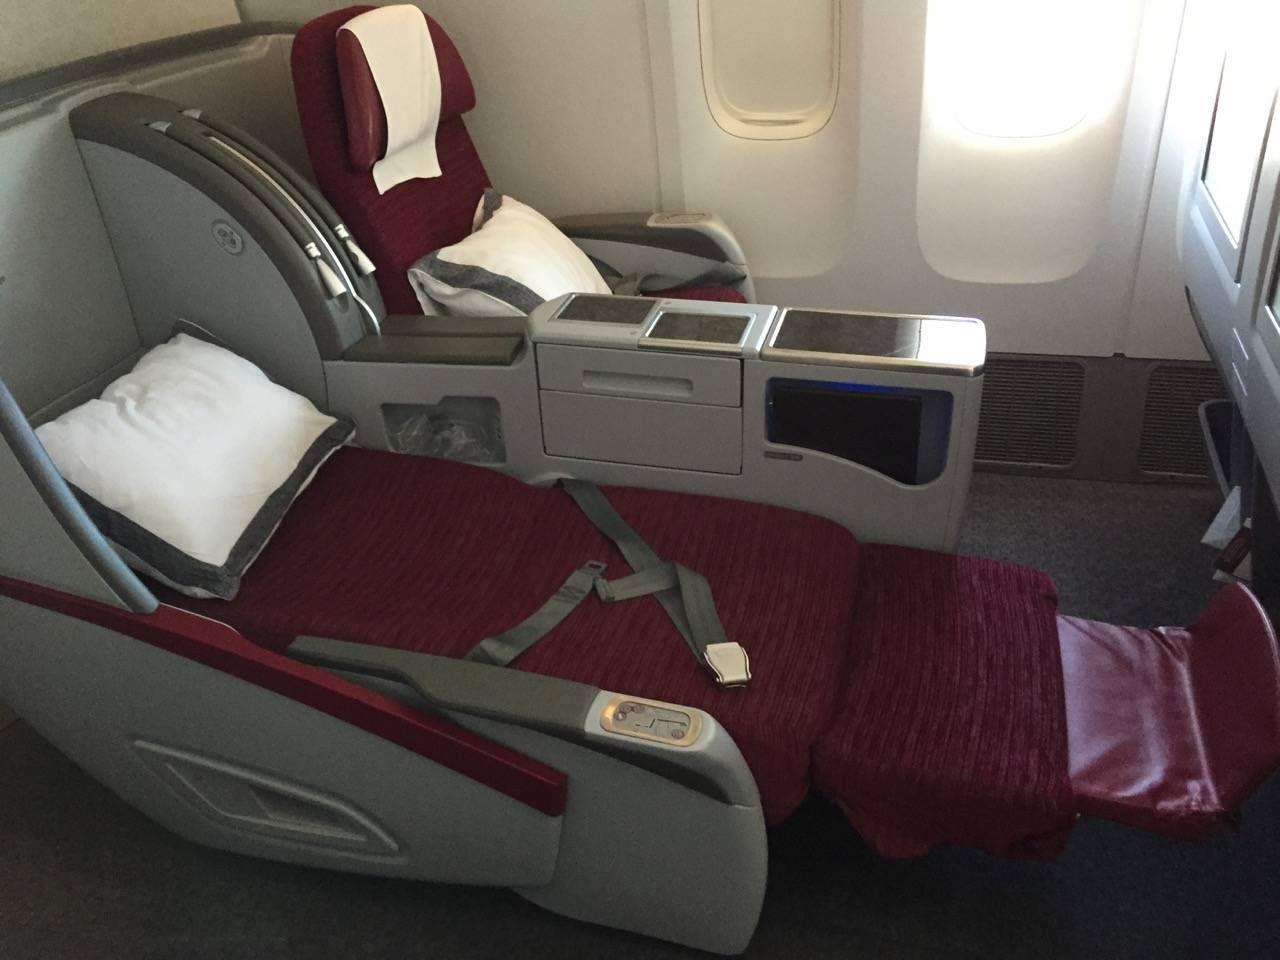 Qatar Business B777-300ER -024